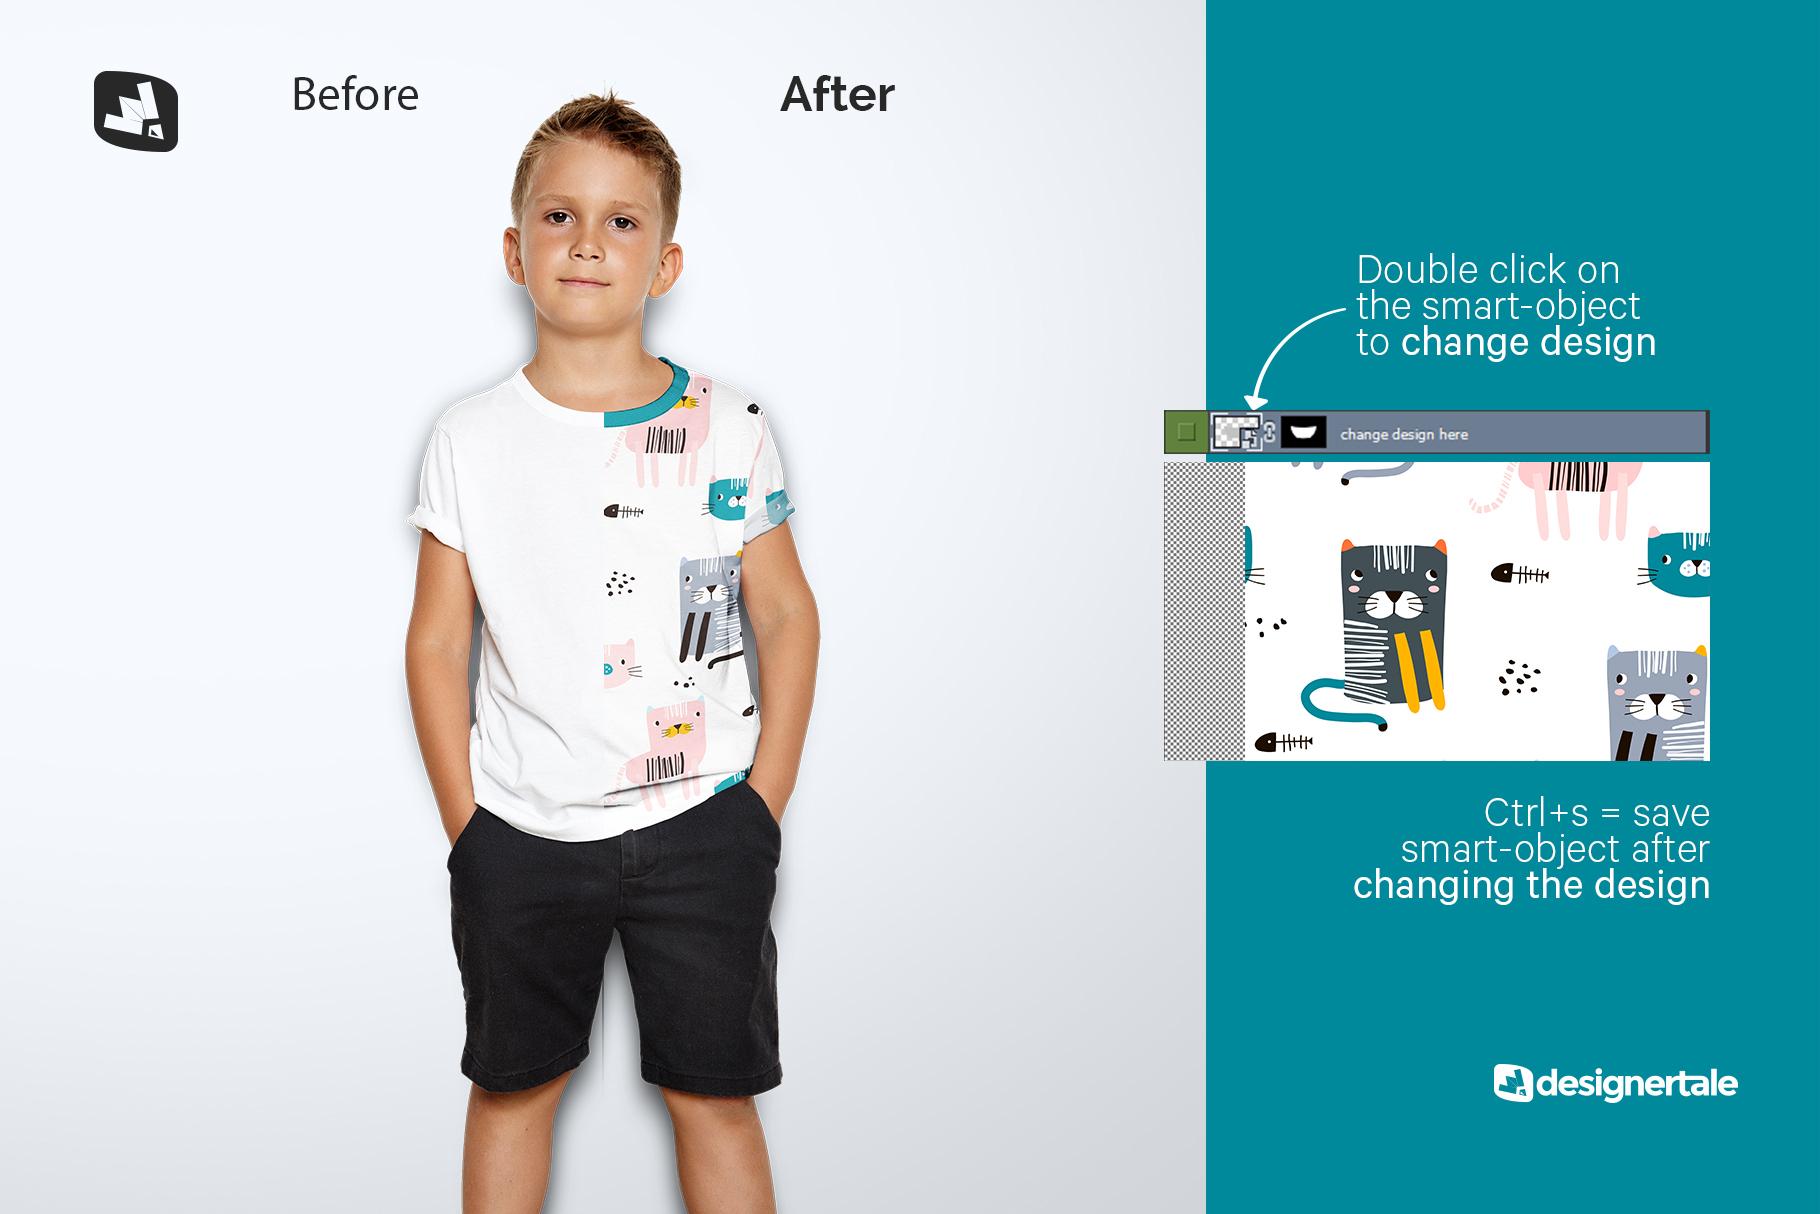 how to change design of the kid's half sleeve tshirt mockup